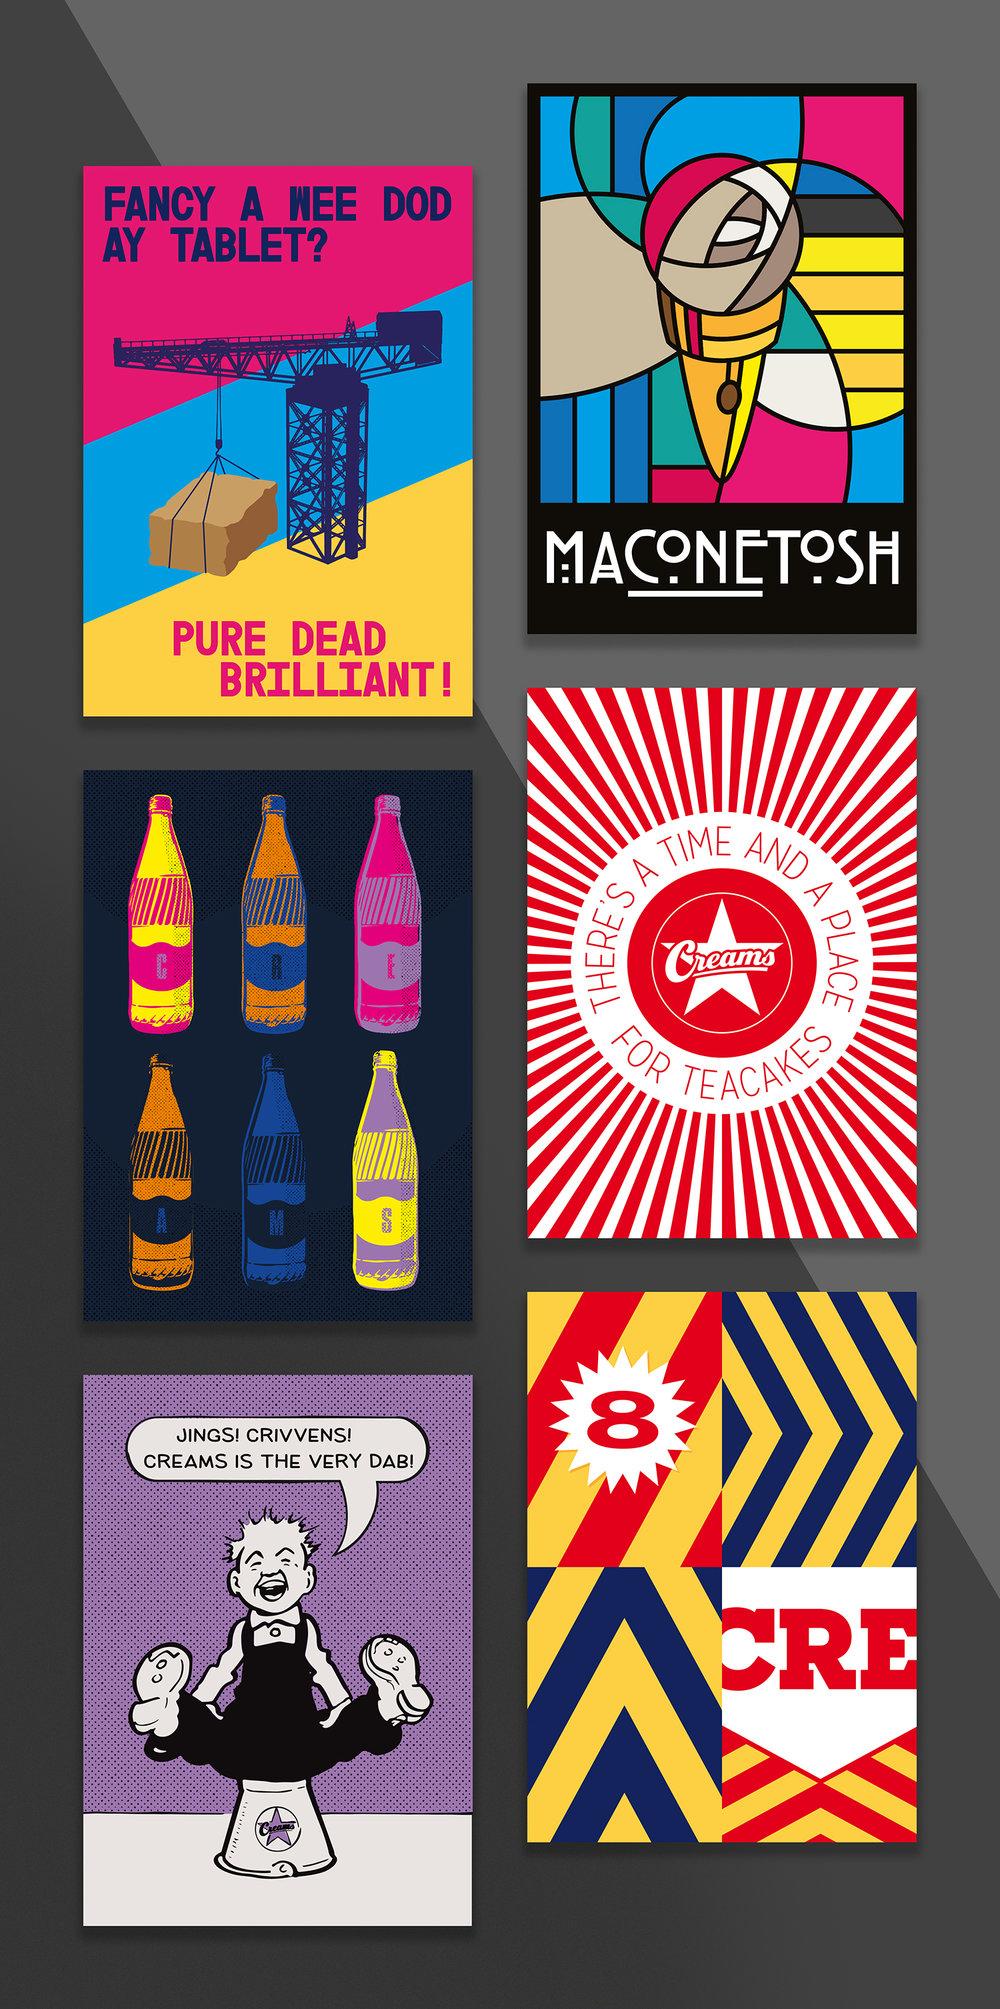 Mascot_Creams_Glasgow_04.jpg